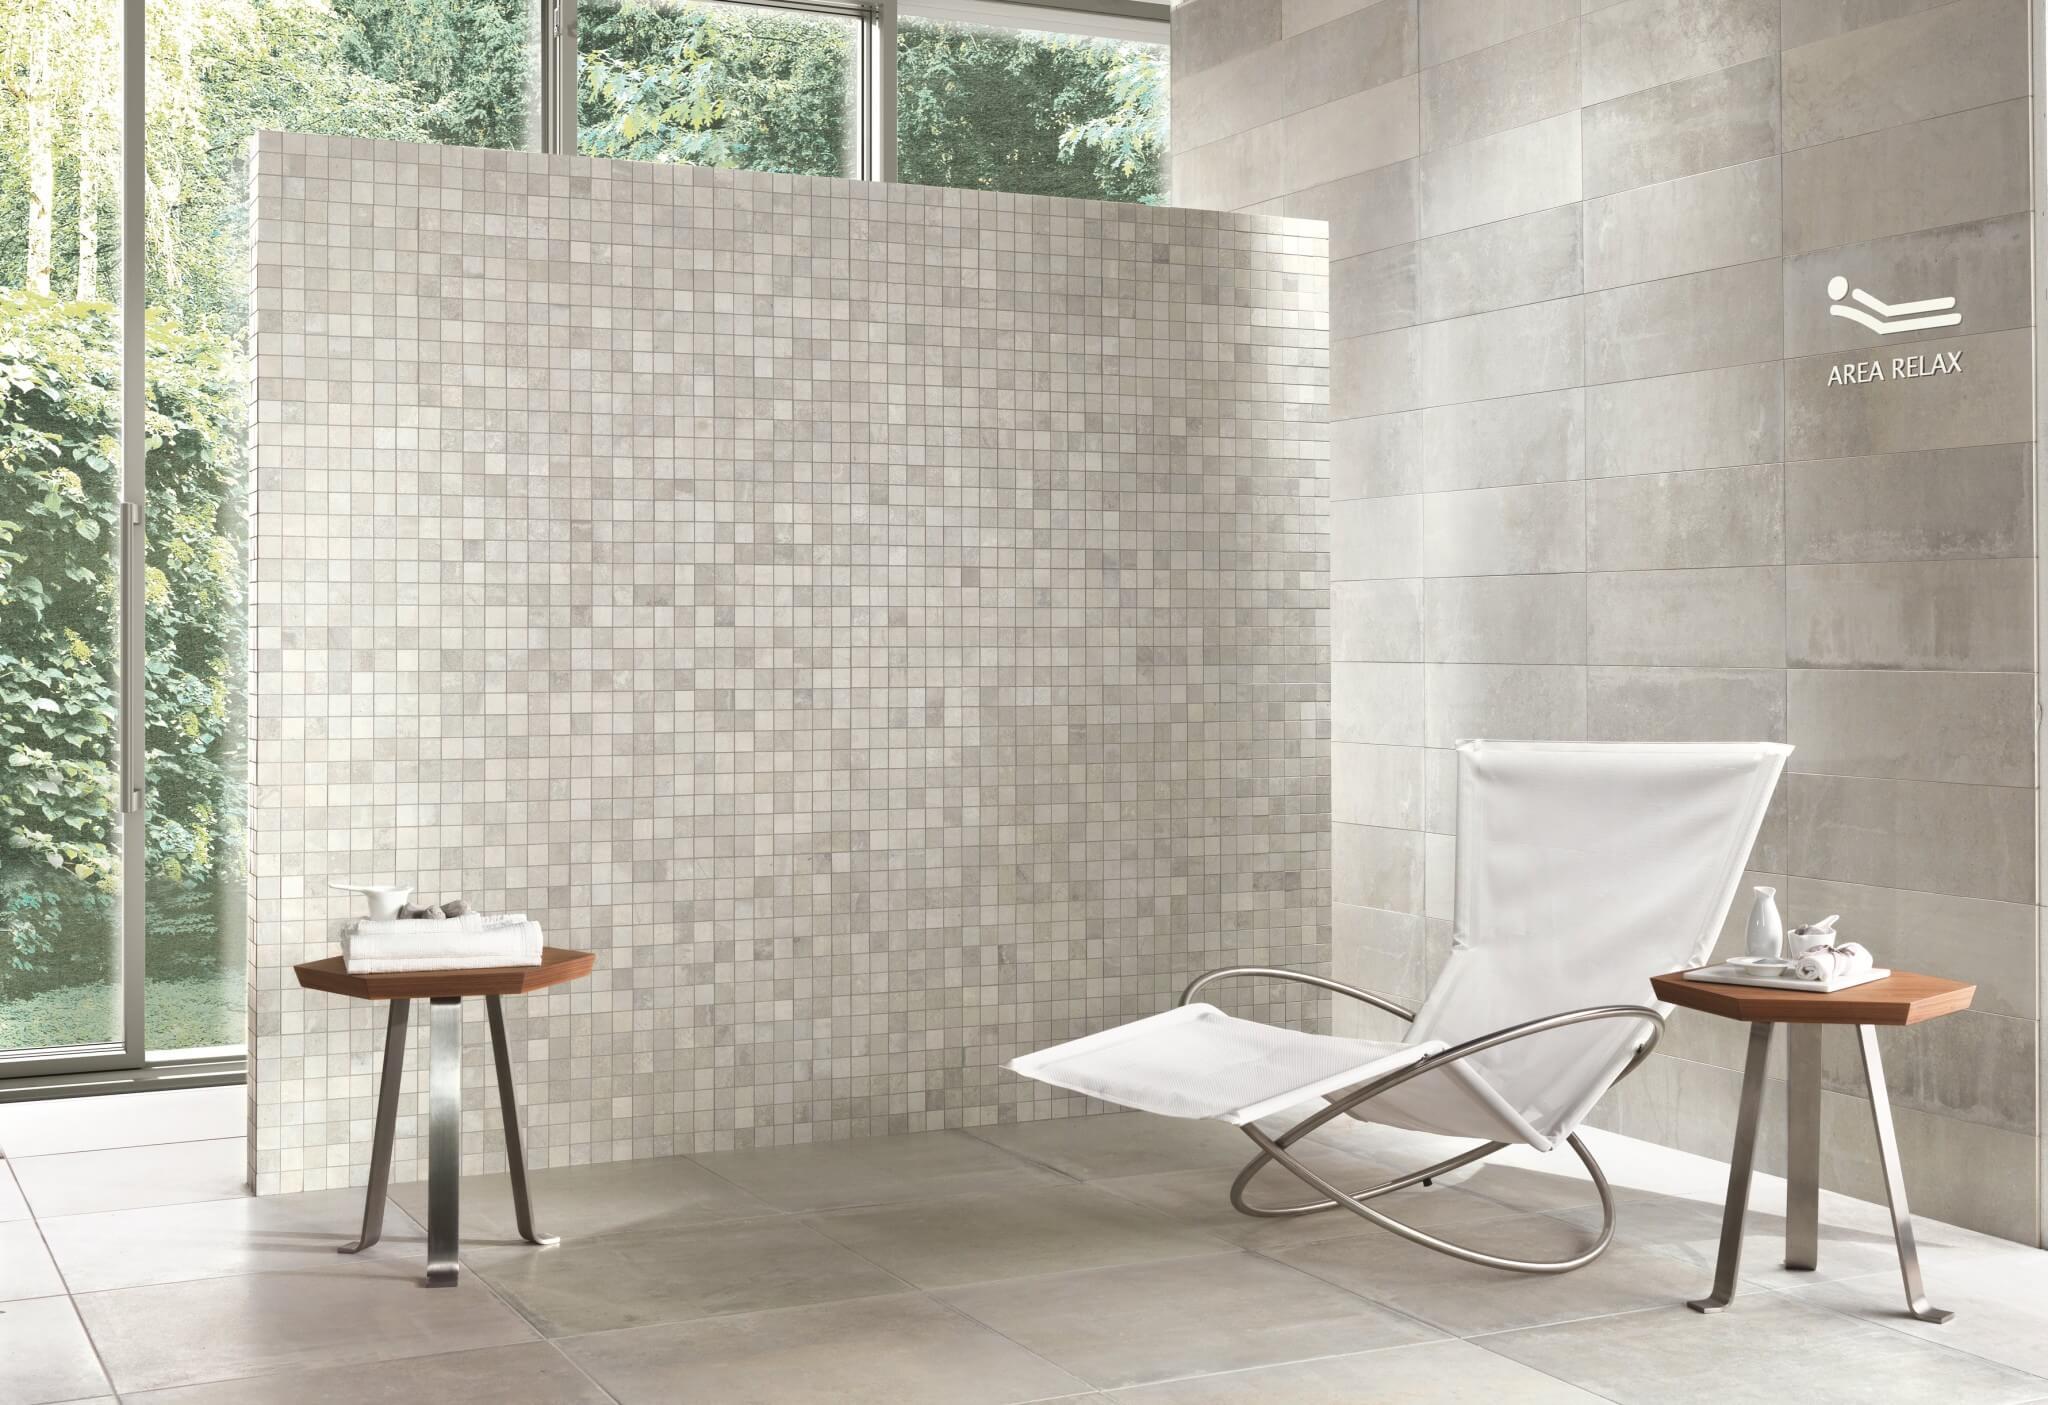 Badkamertegels beige badkamertegels mat of glans wandtegels vloertegels tegels keramisch - Porcelanosa tegel badkamer ...